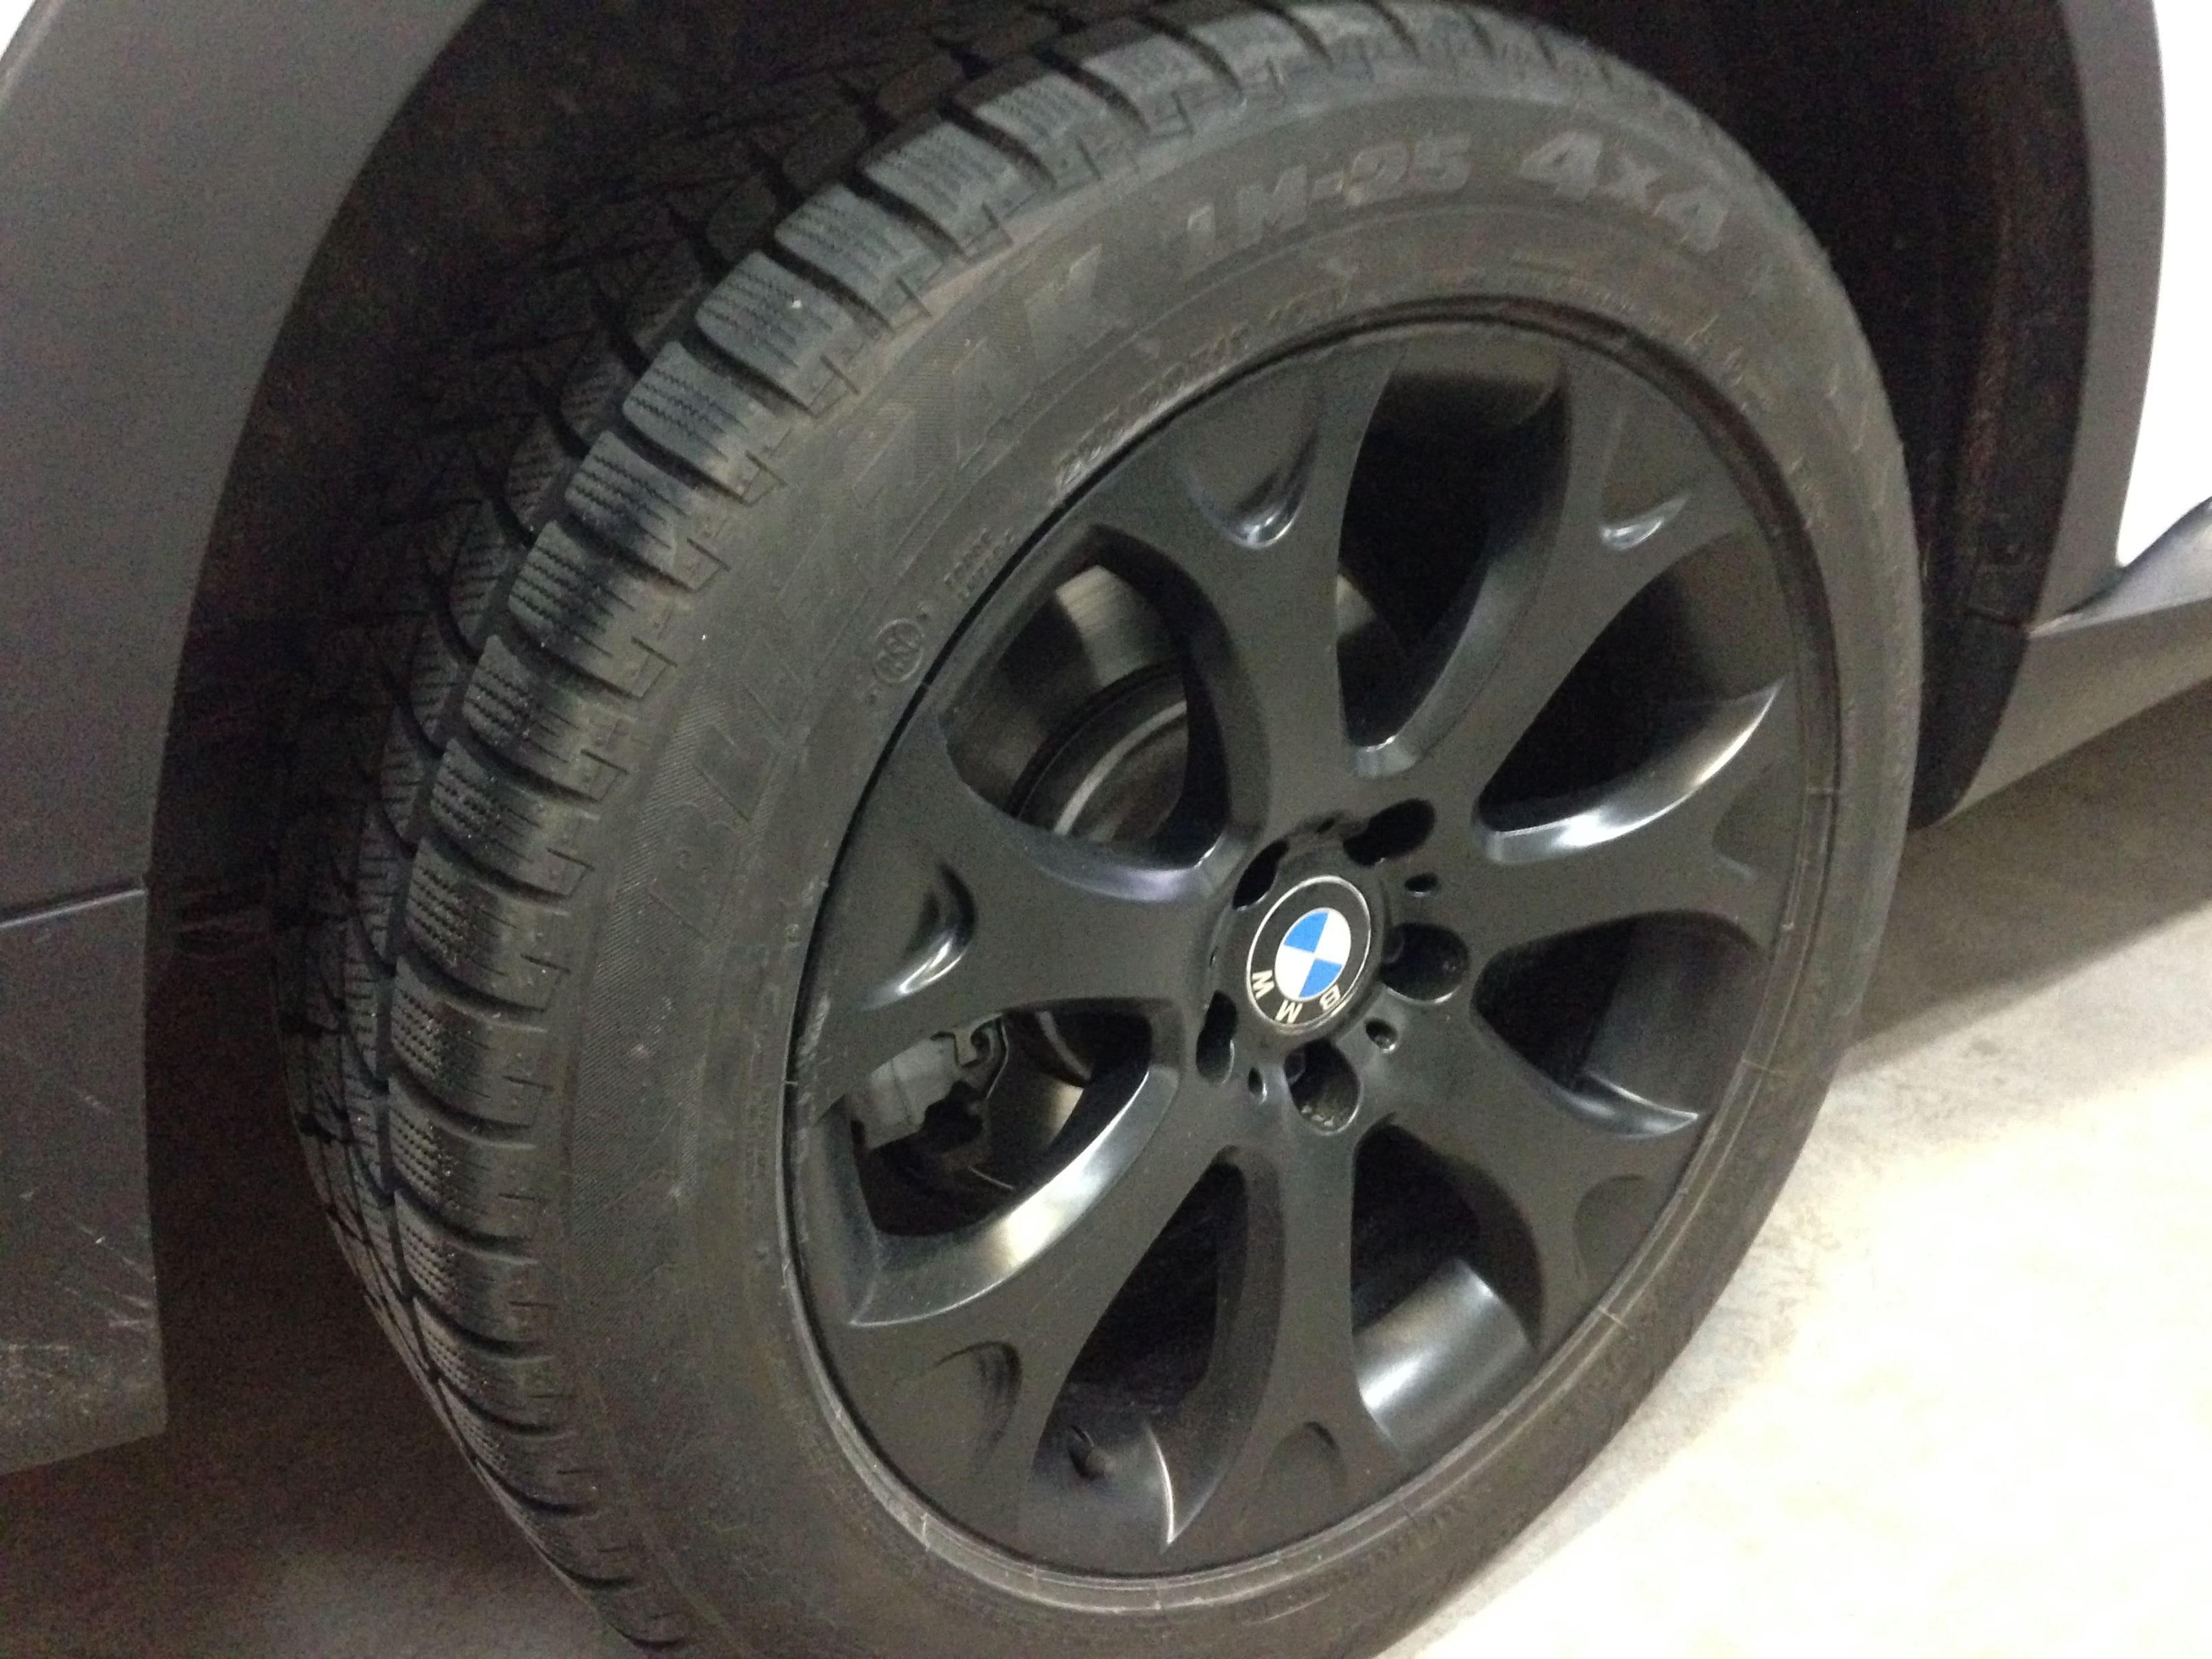 BMW X5 met Glossy White Wrap, Carwrapping door Wrapmyride.nu Foto-nr:5427, ©2021